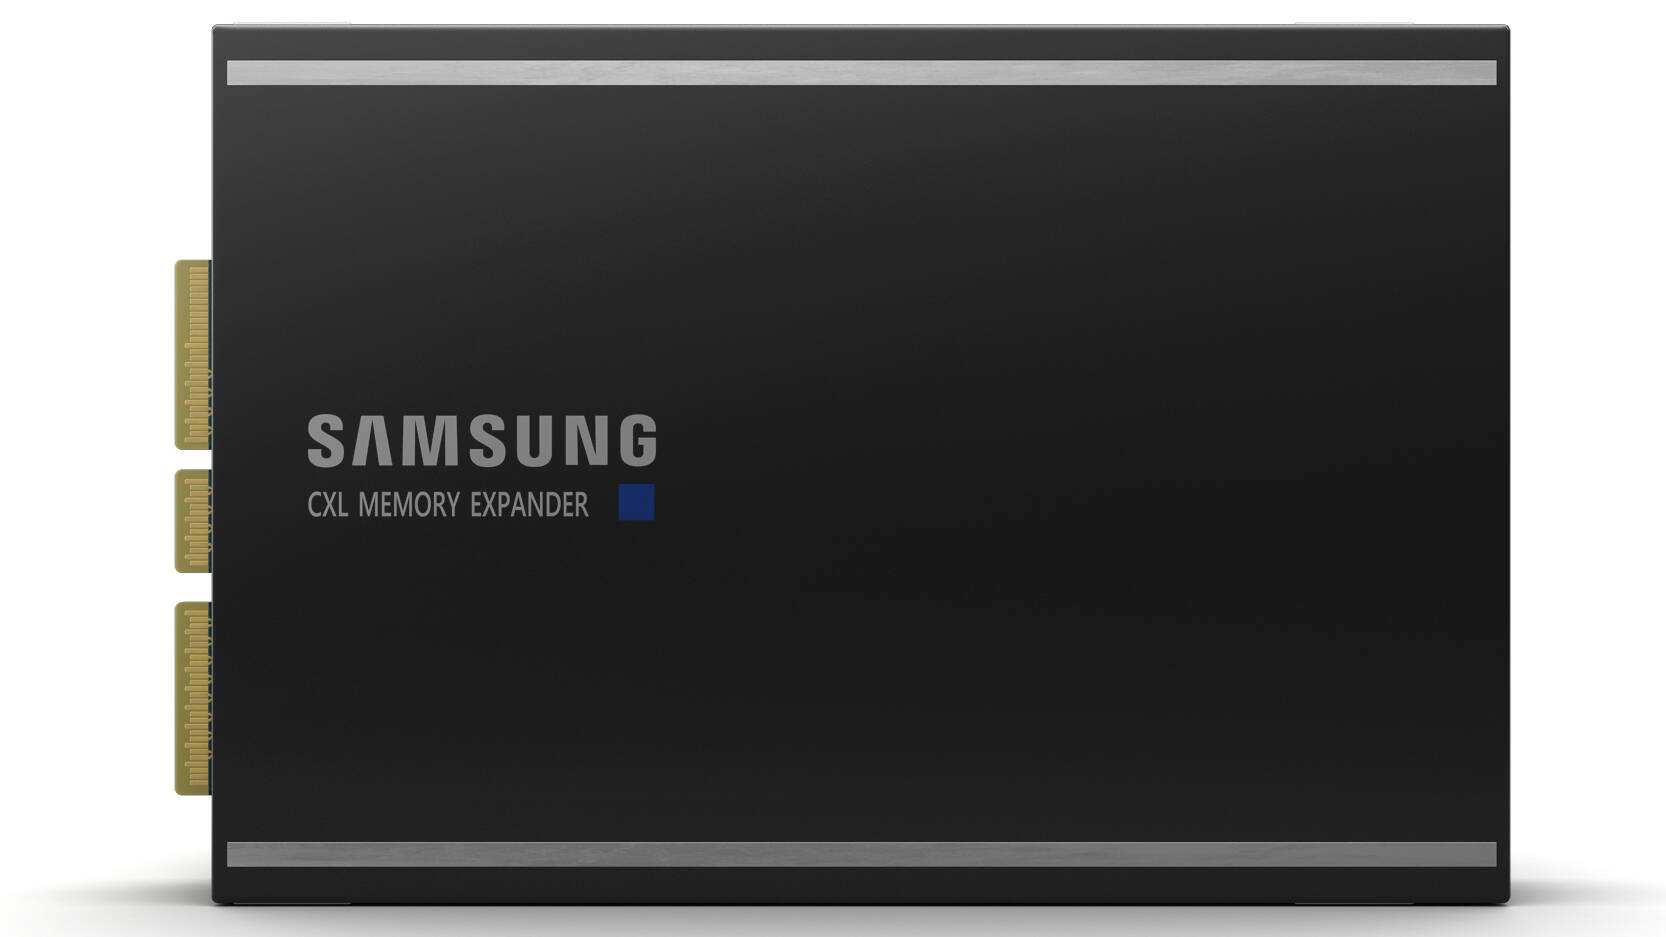 Samsung CLX memory module